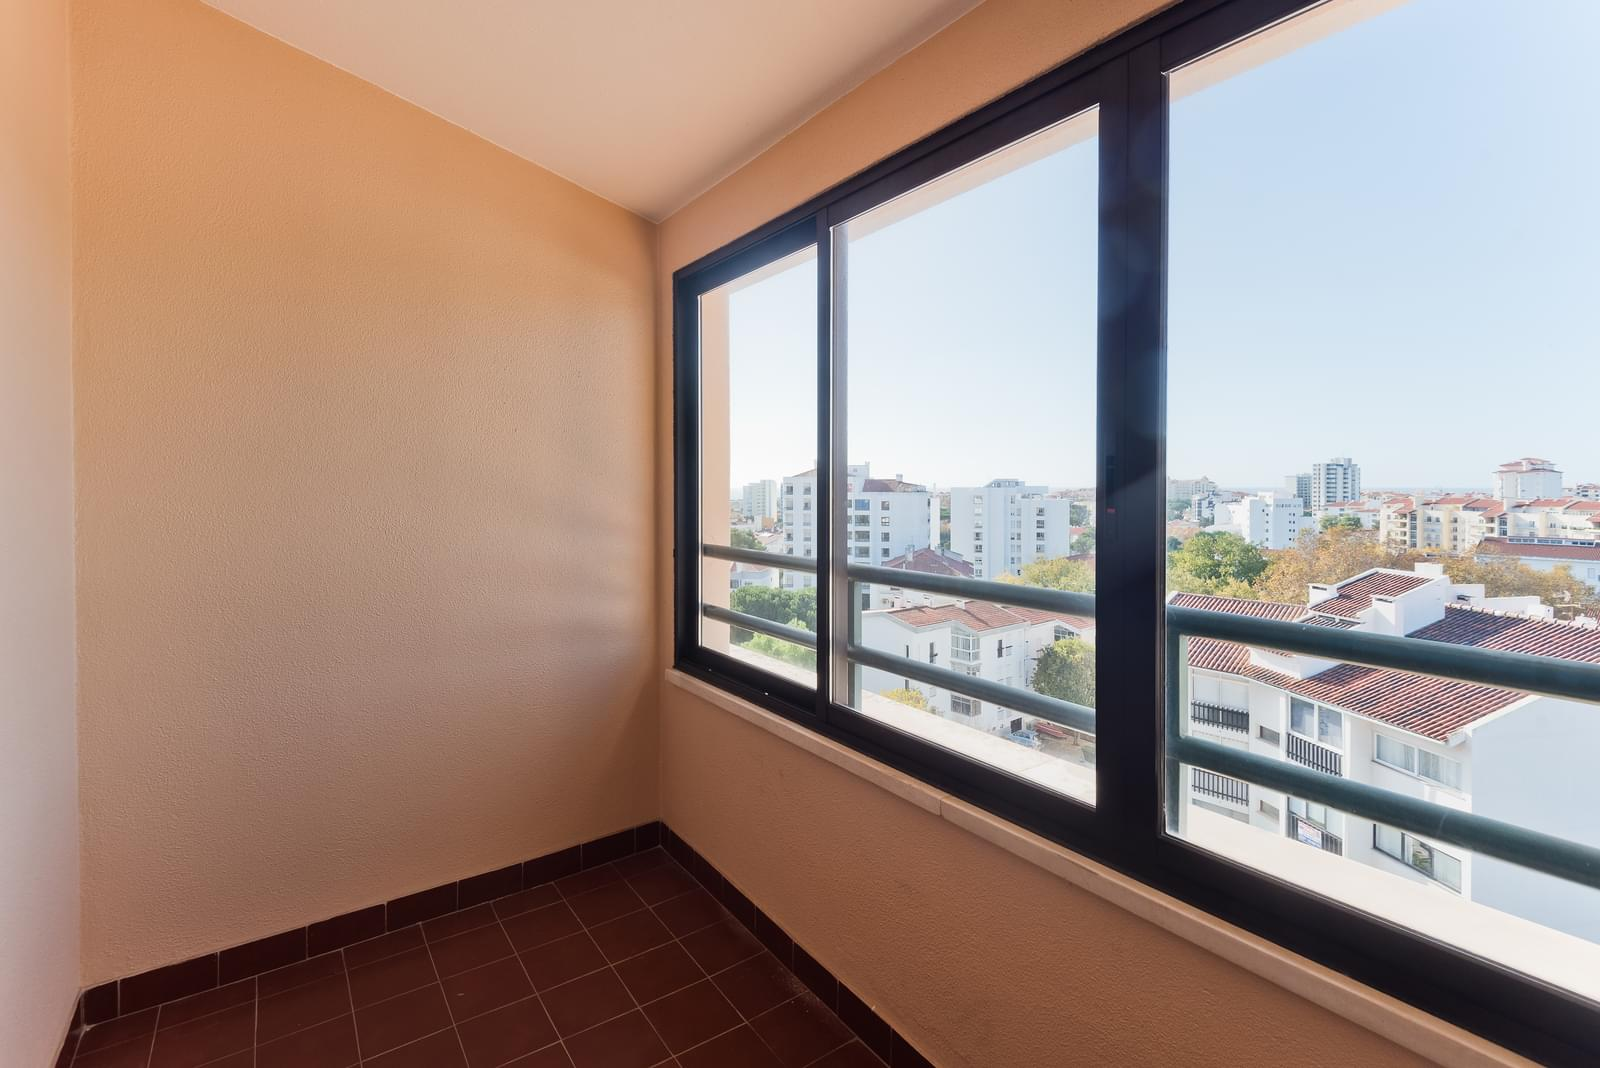 pf18730-apartamento-t2-cascais-4e91eeb6-d72d-45fb-83f6-2270e9d7d0e9